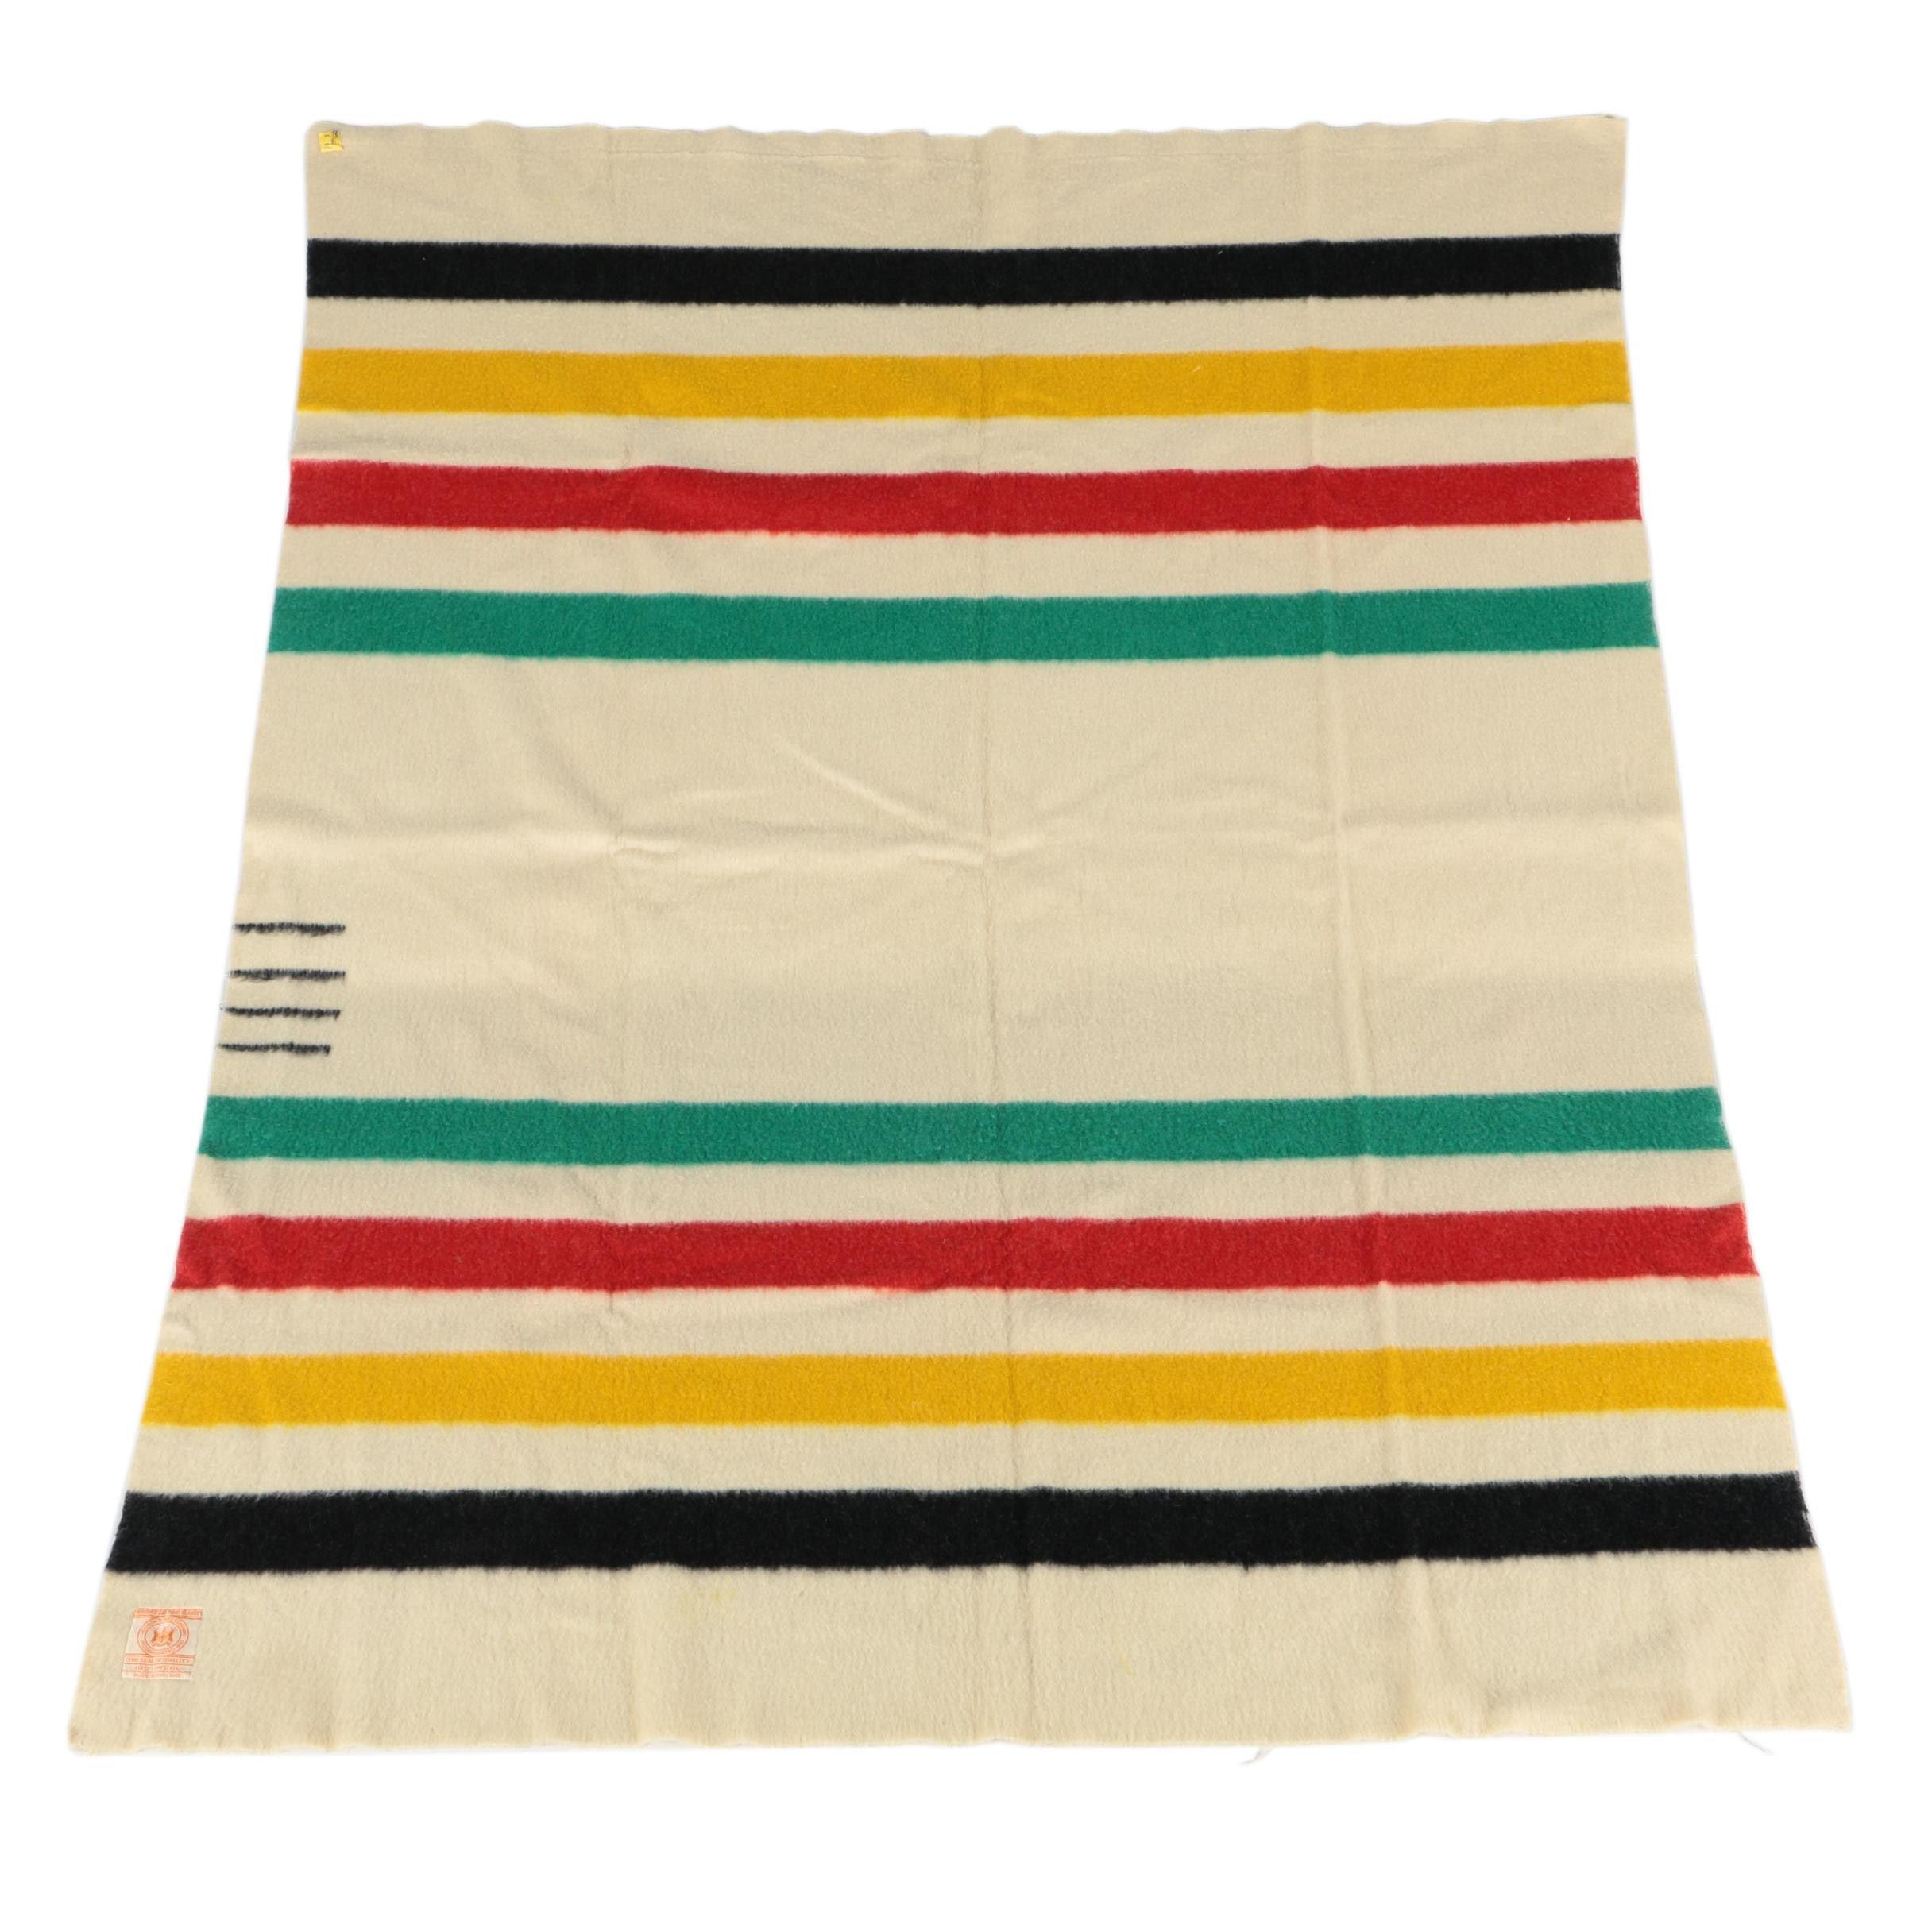 Vintage Hudson's Bay Point Wool Blanket